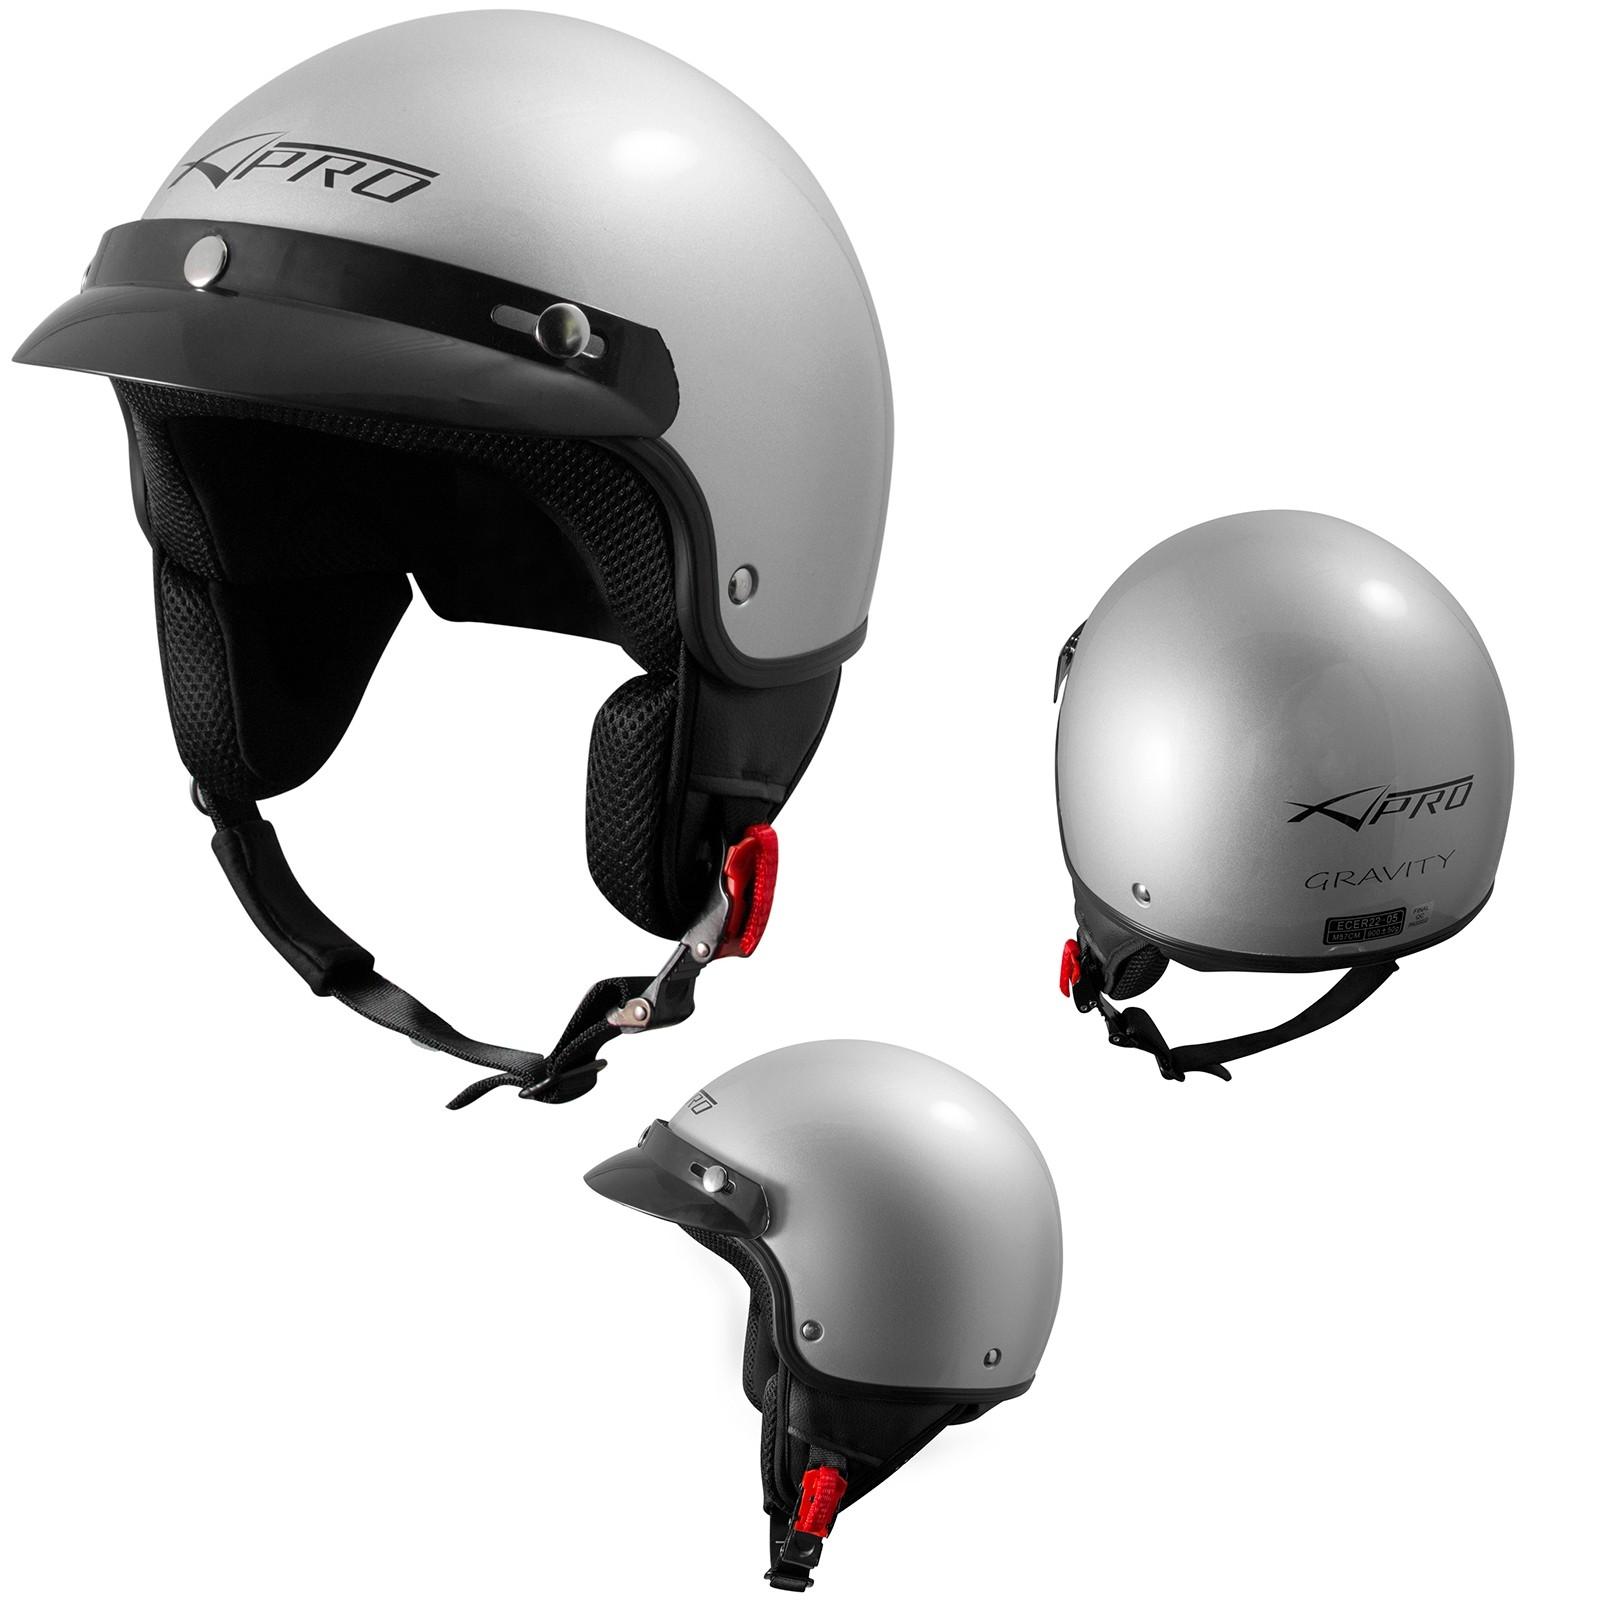 Gravity-Casco-Jet-Helmet-Motorcycle-Argento-Silver-A-Pro-Sonic-Moto-Set